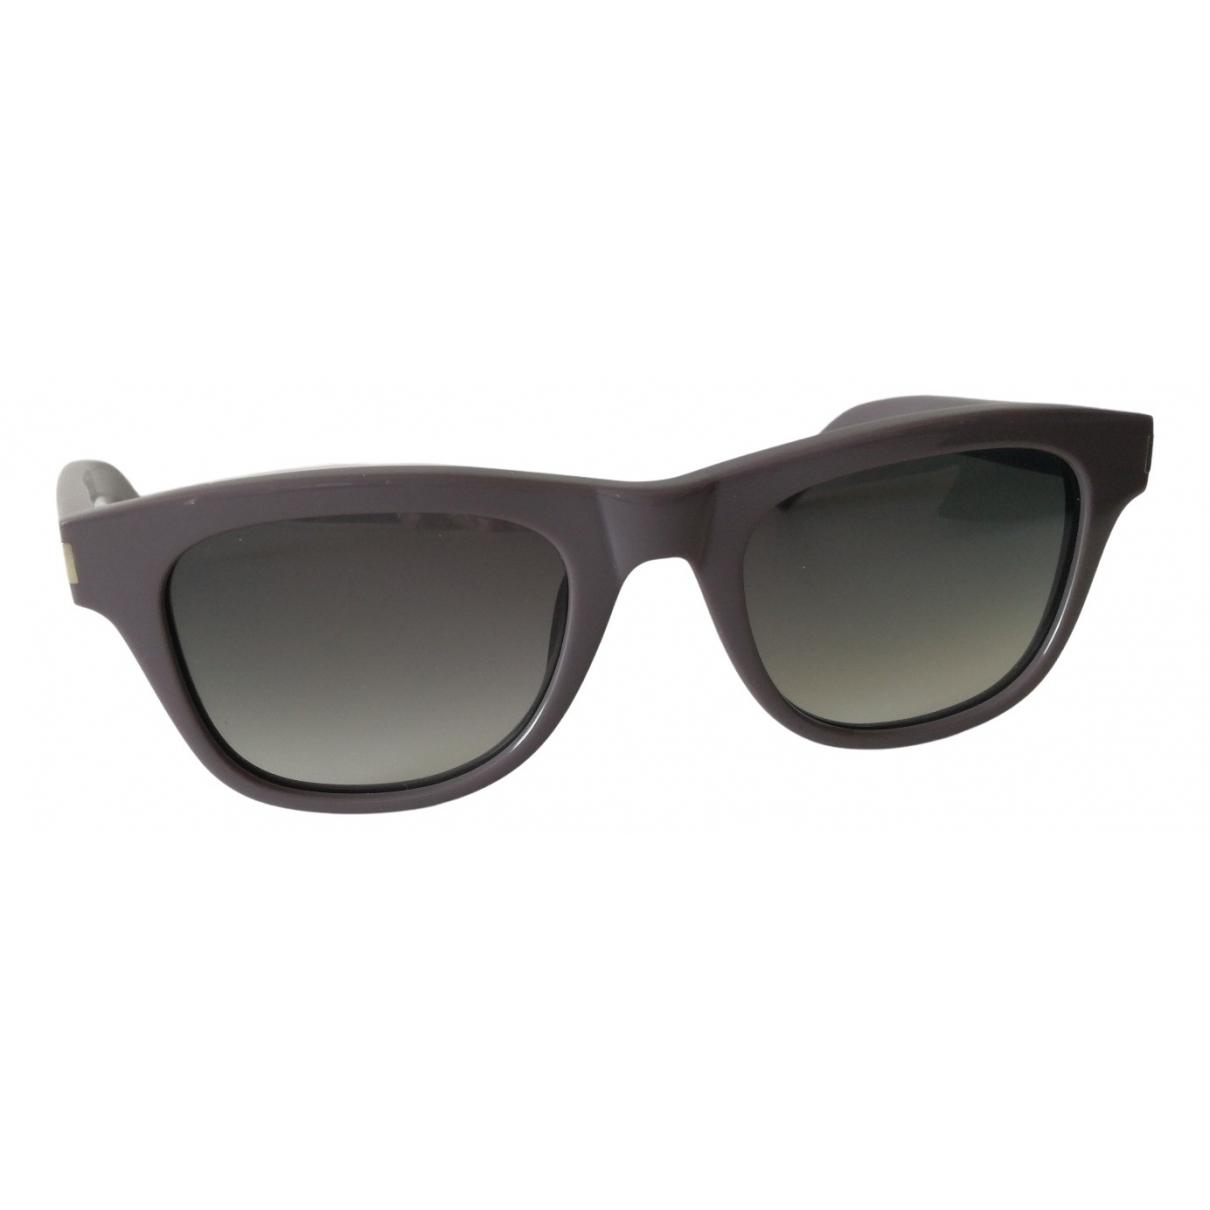 Saint Laurent \N Sonnenbrillen in  Grau Kunststoff